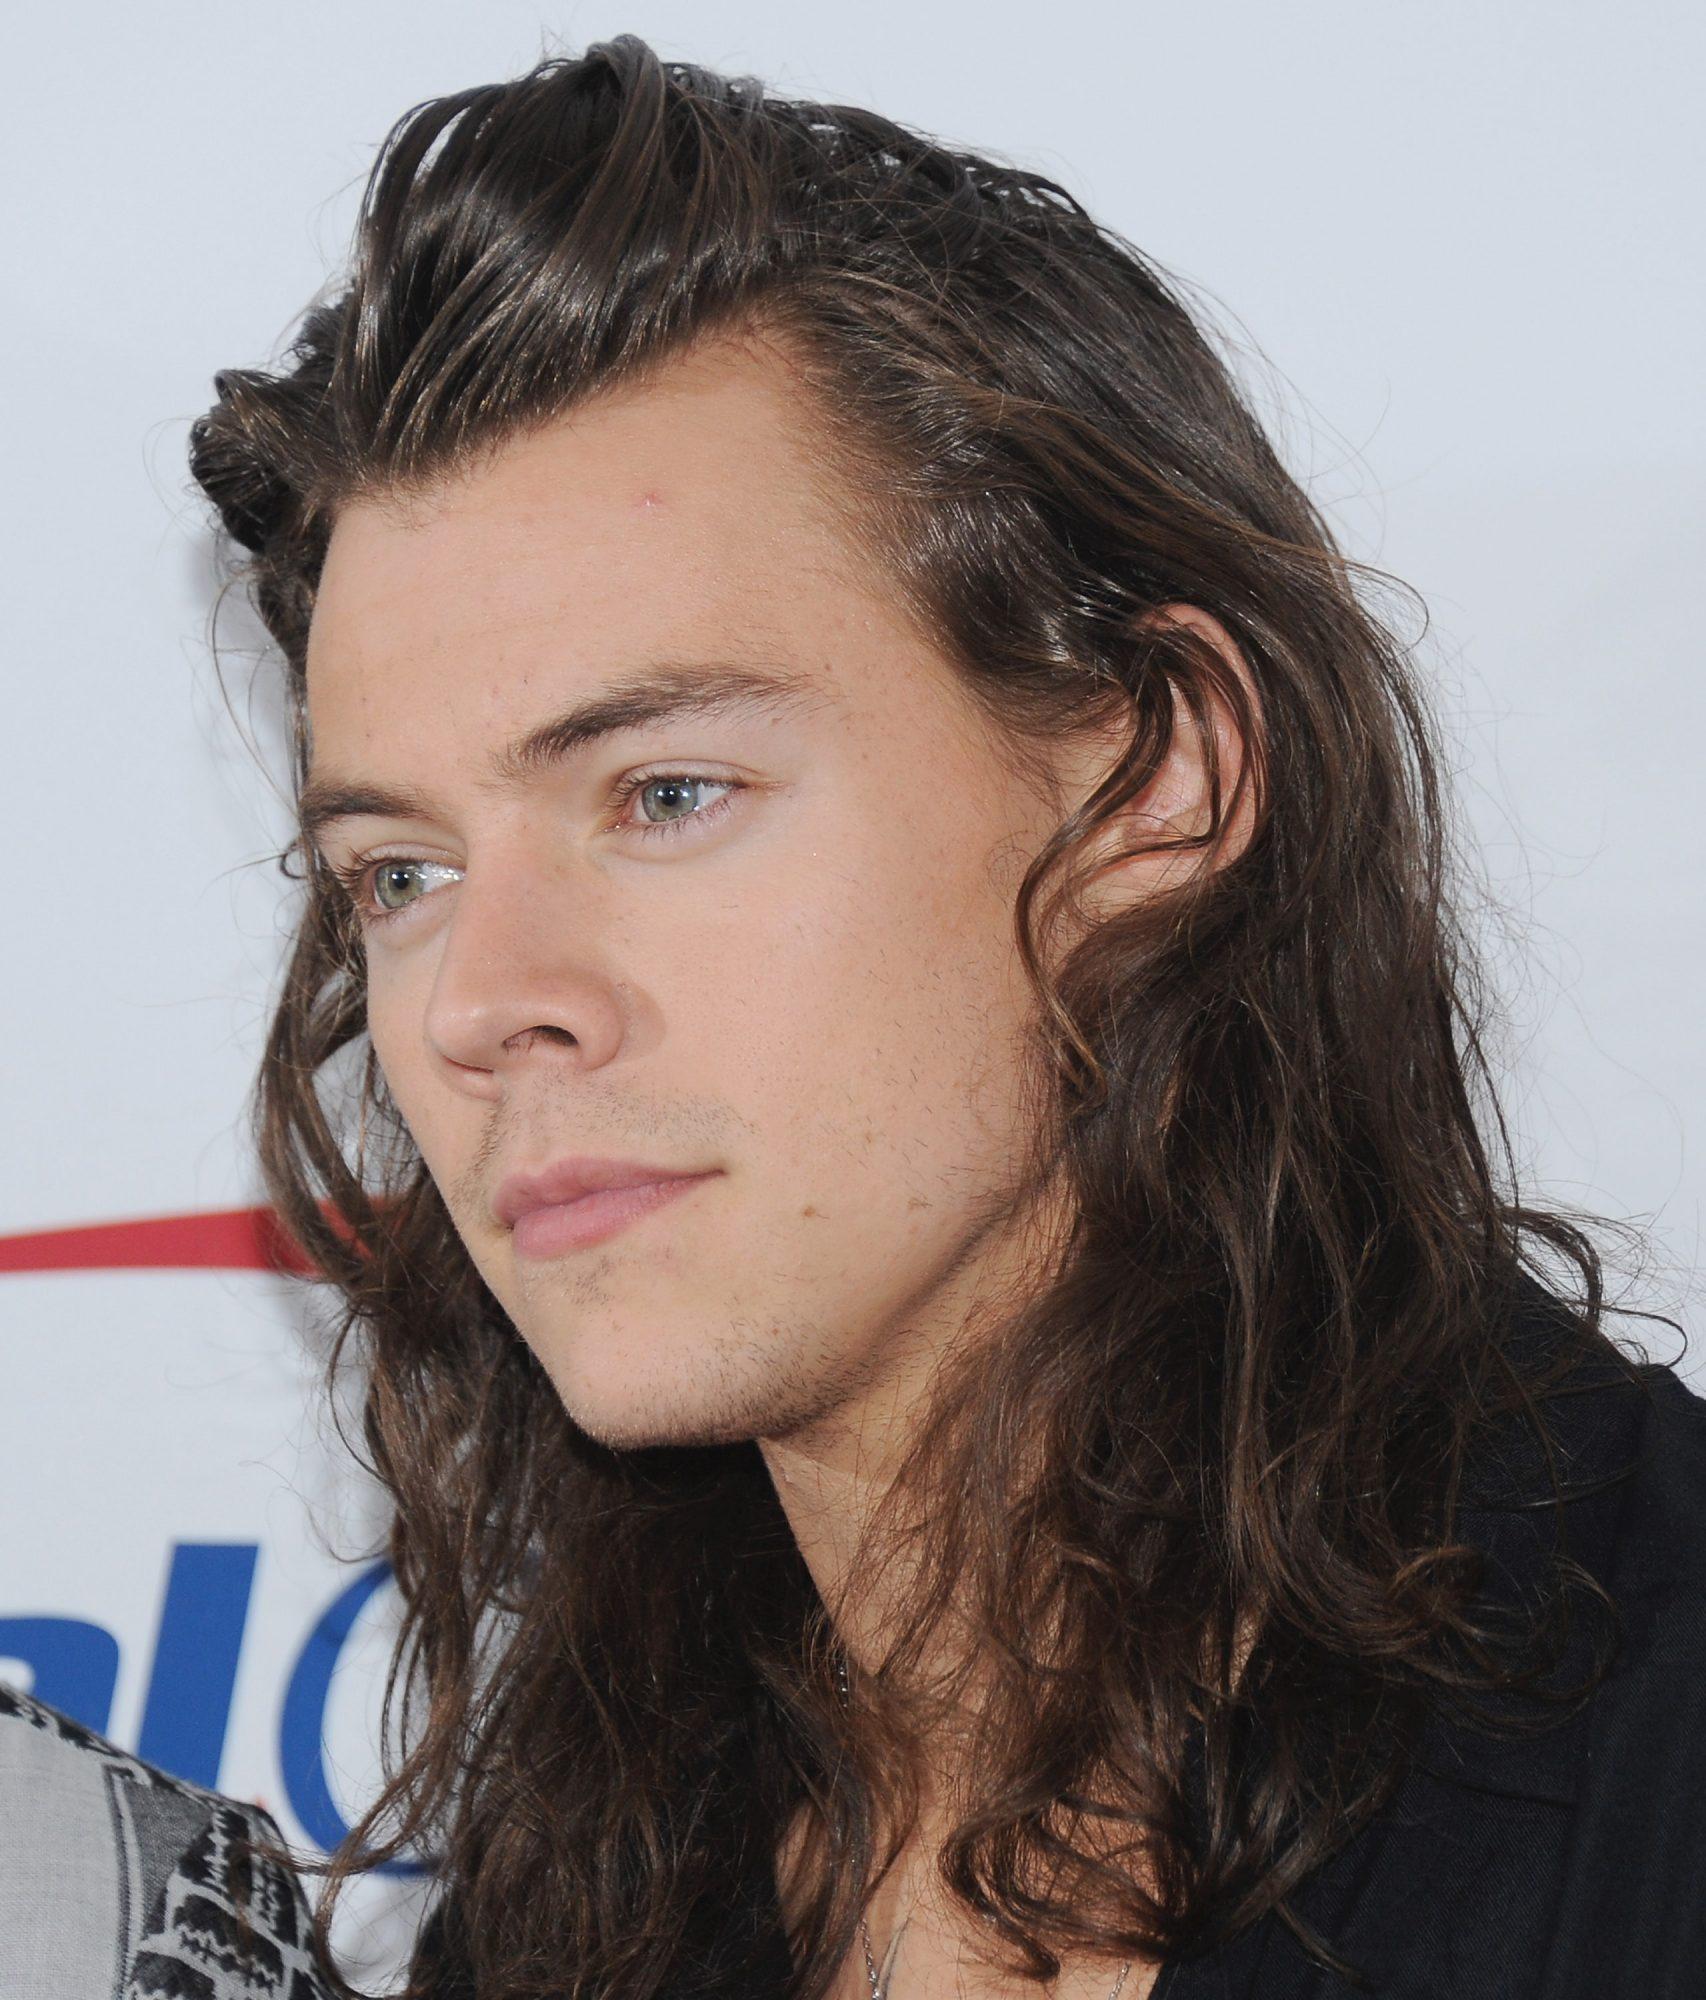 Harry-long-hair.jpg